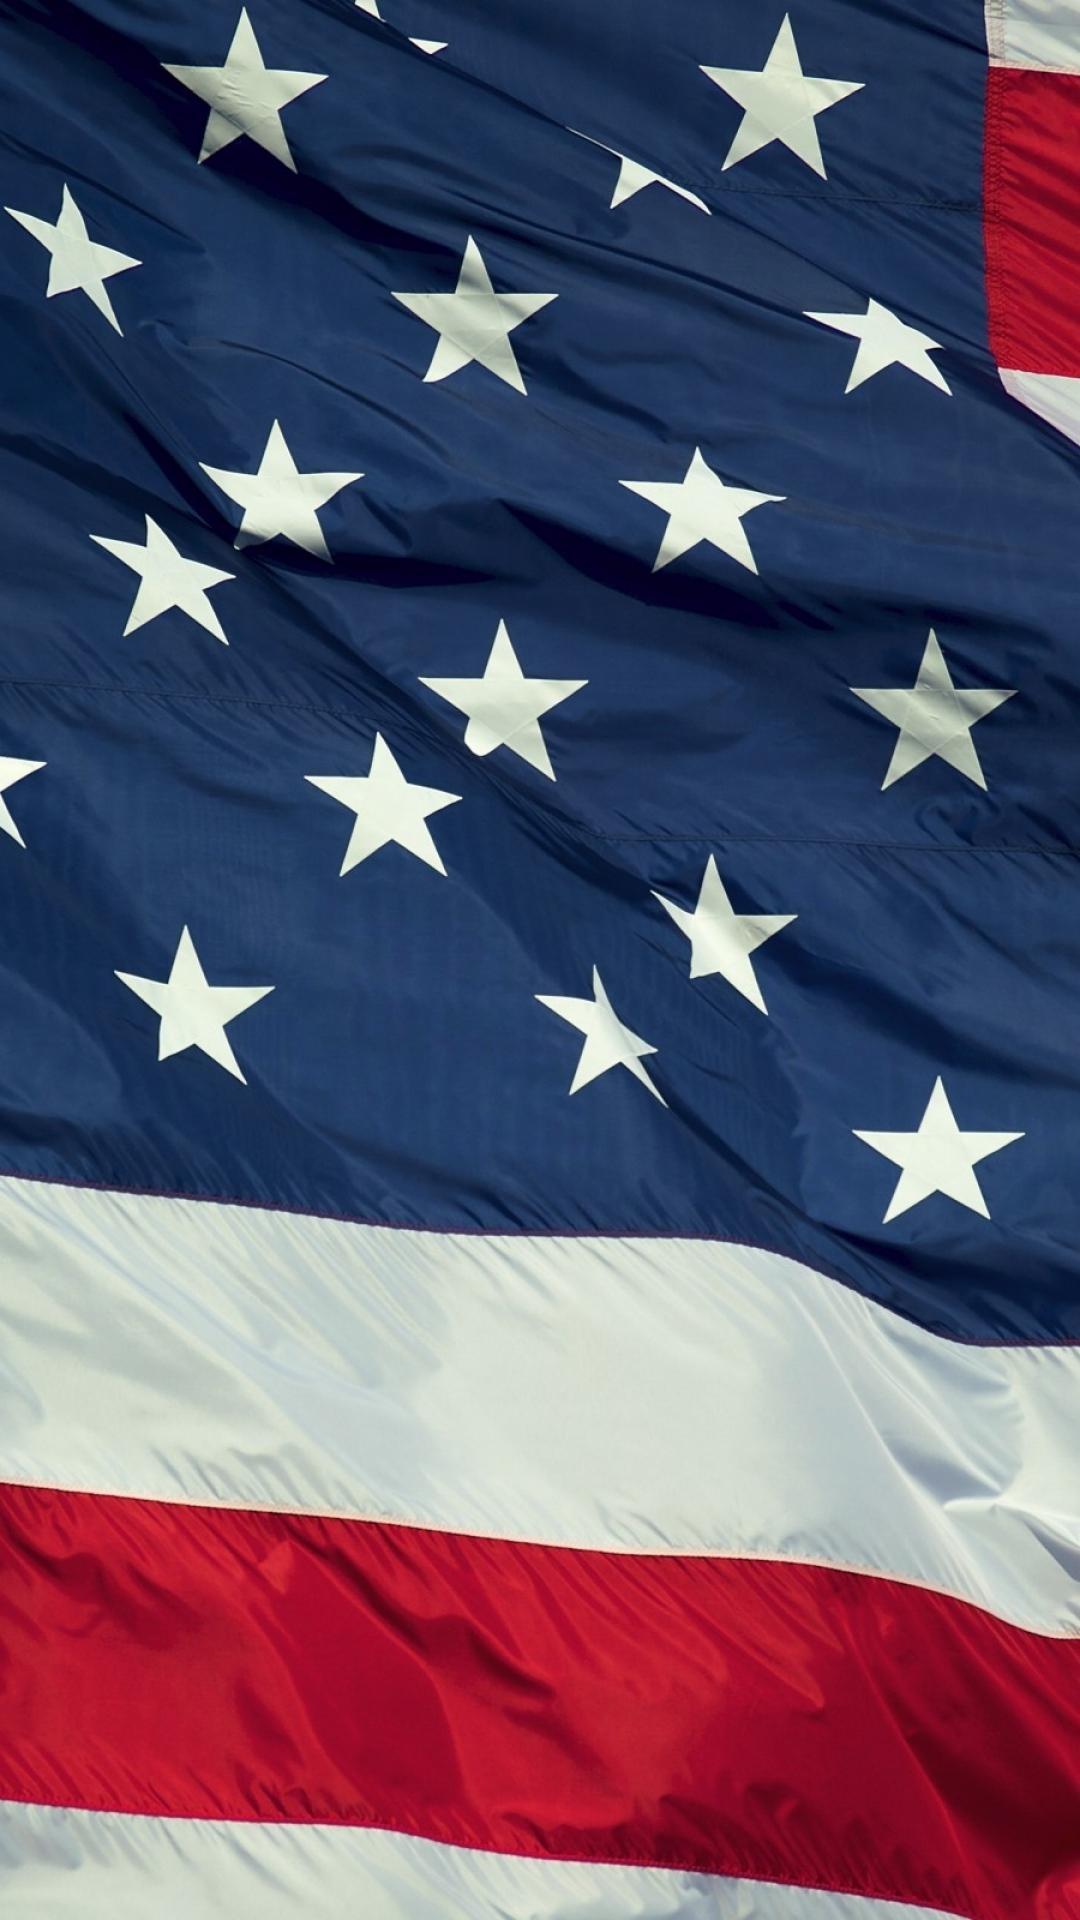 wallpaper.wiki-Cool-American-Flag-Iphone-Wallpaper-PIC-